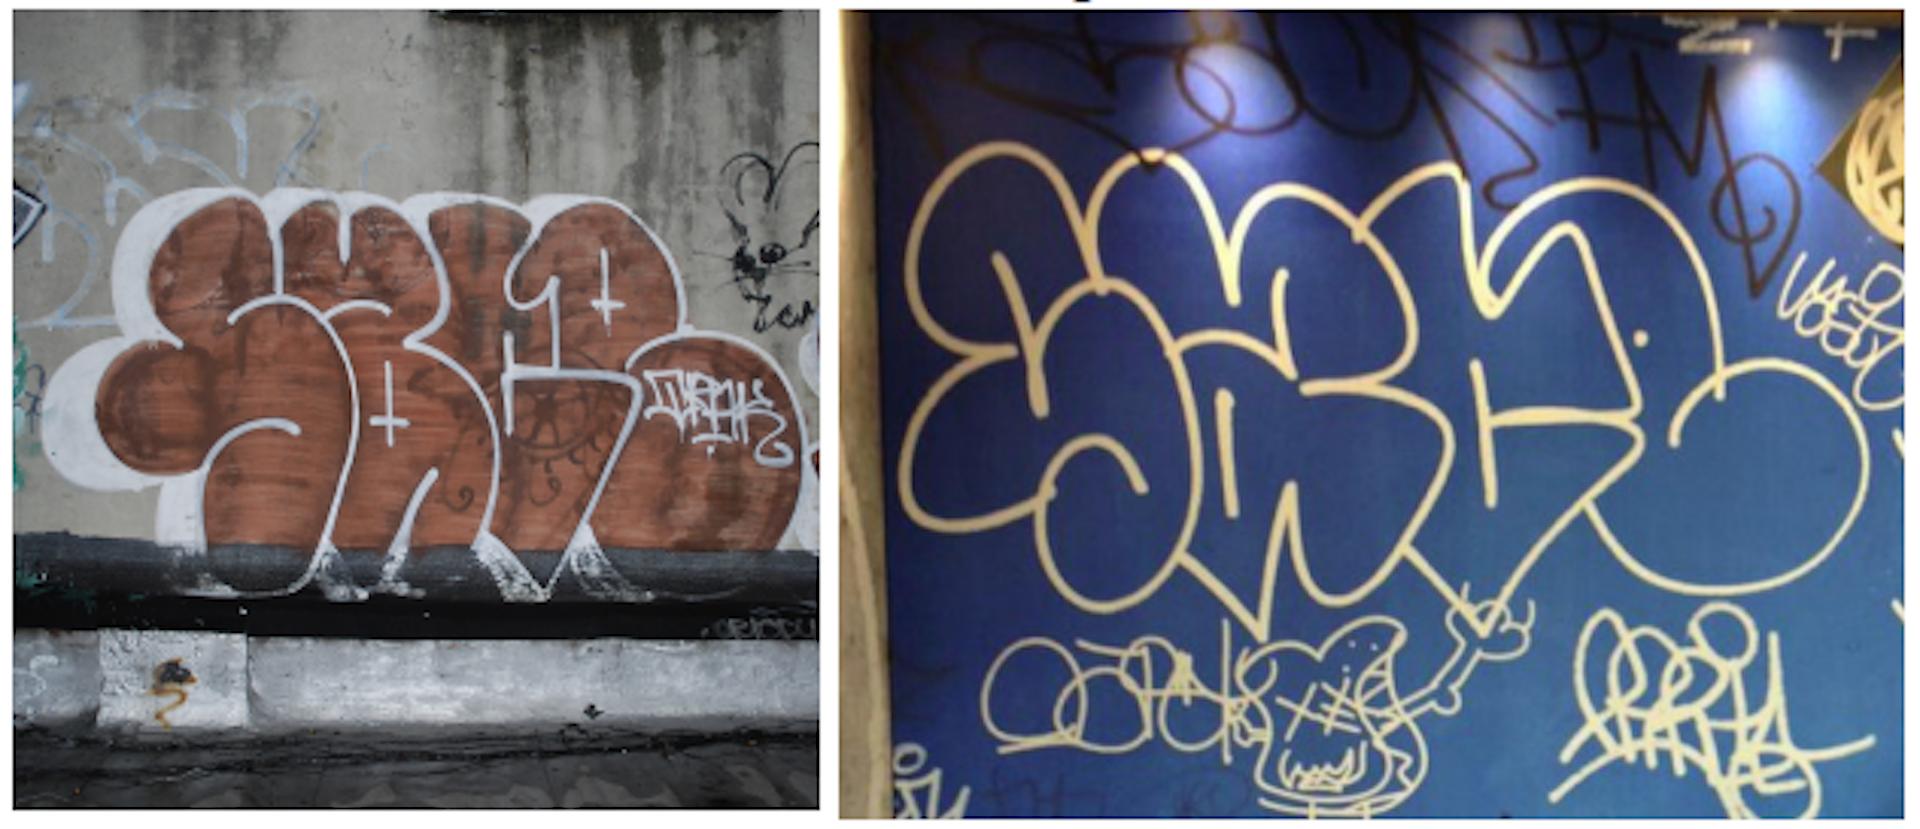 mcdonald u0026 39 s accused of copying graffiti logo  u2013 here u0026 39 s why we should protect street artists